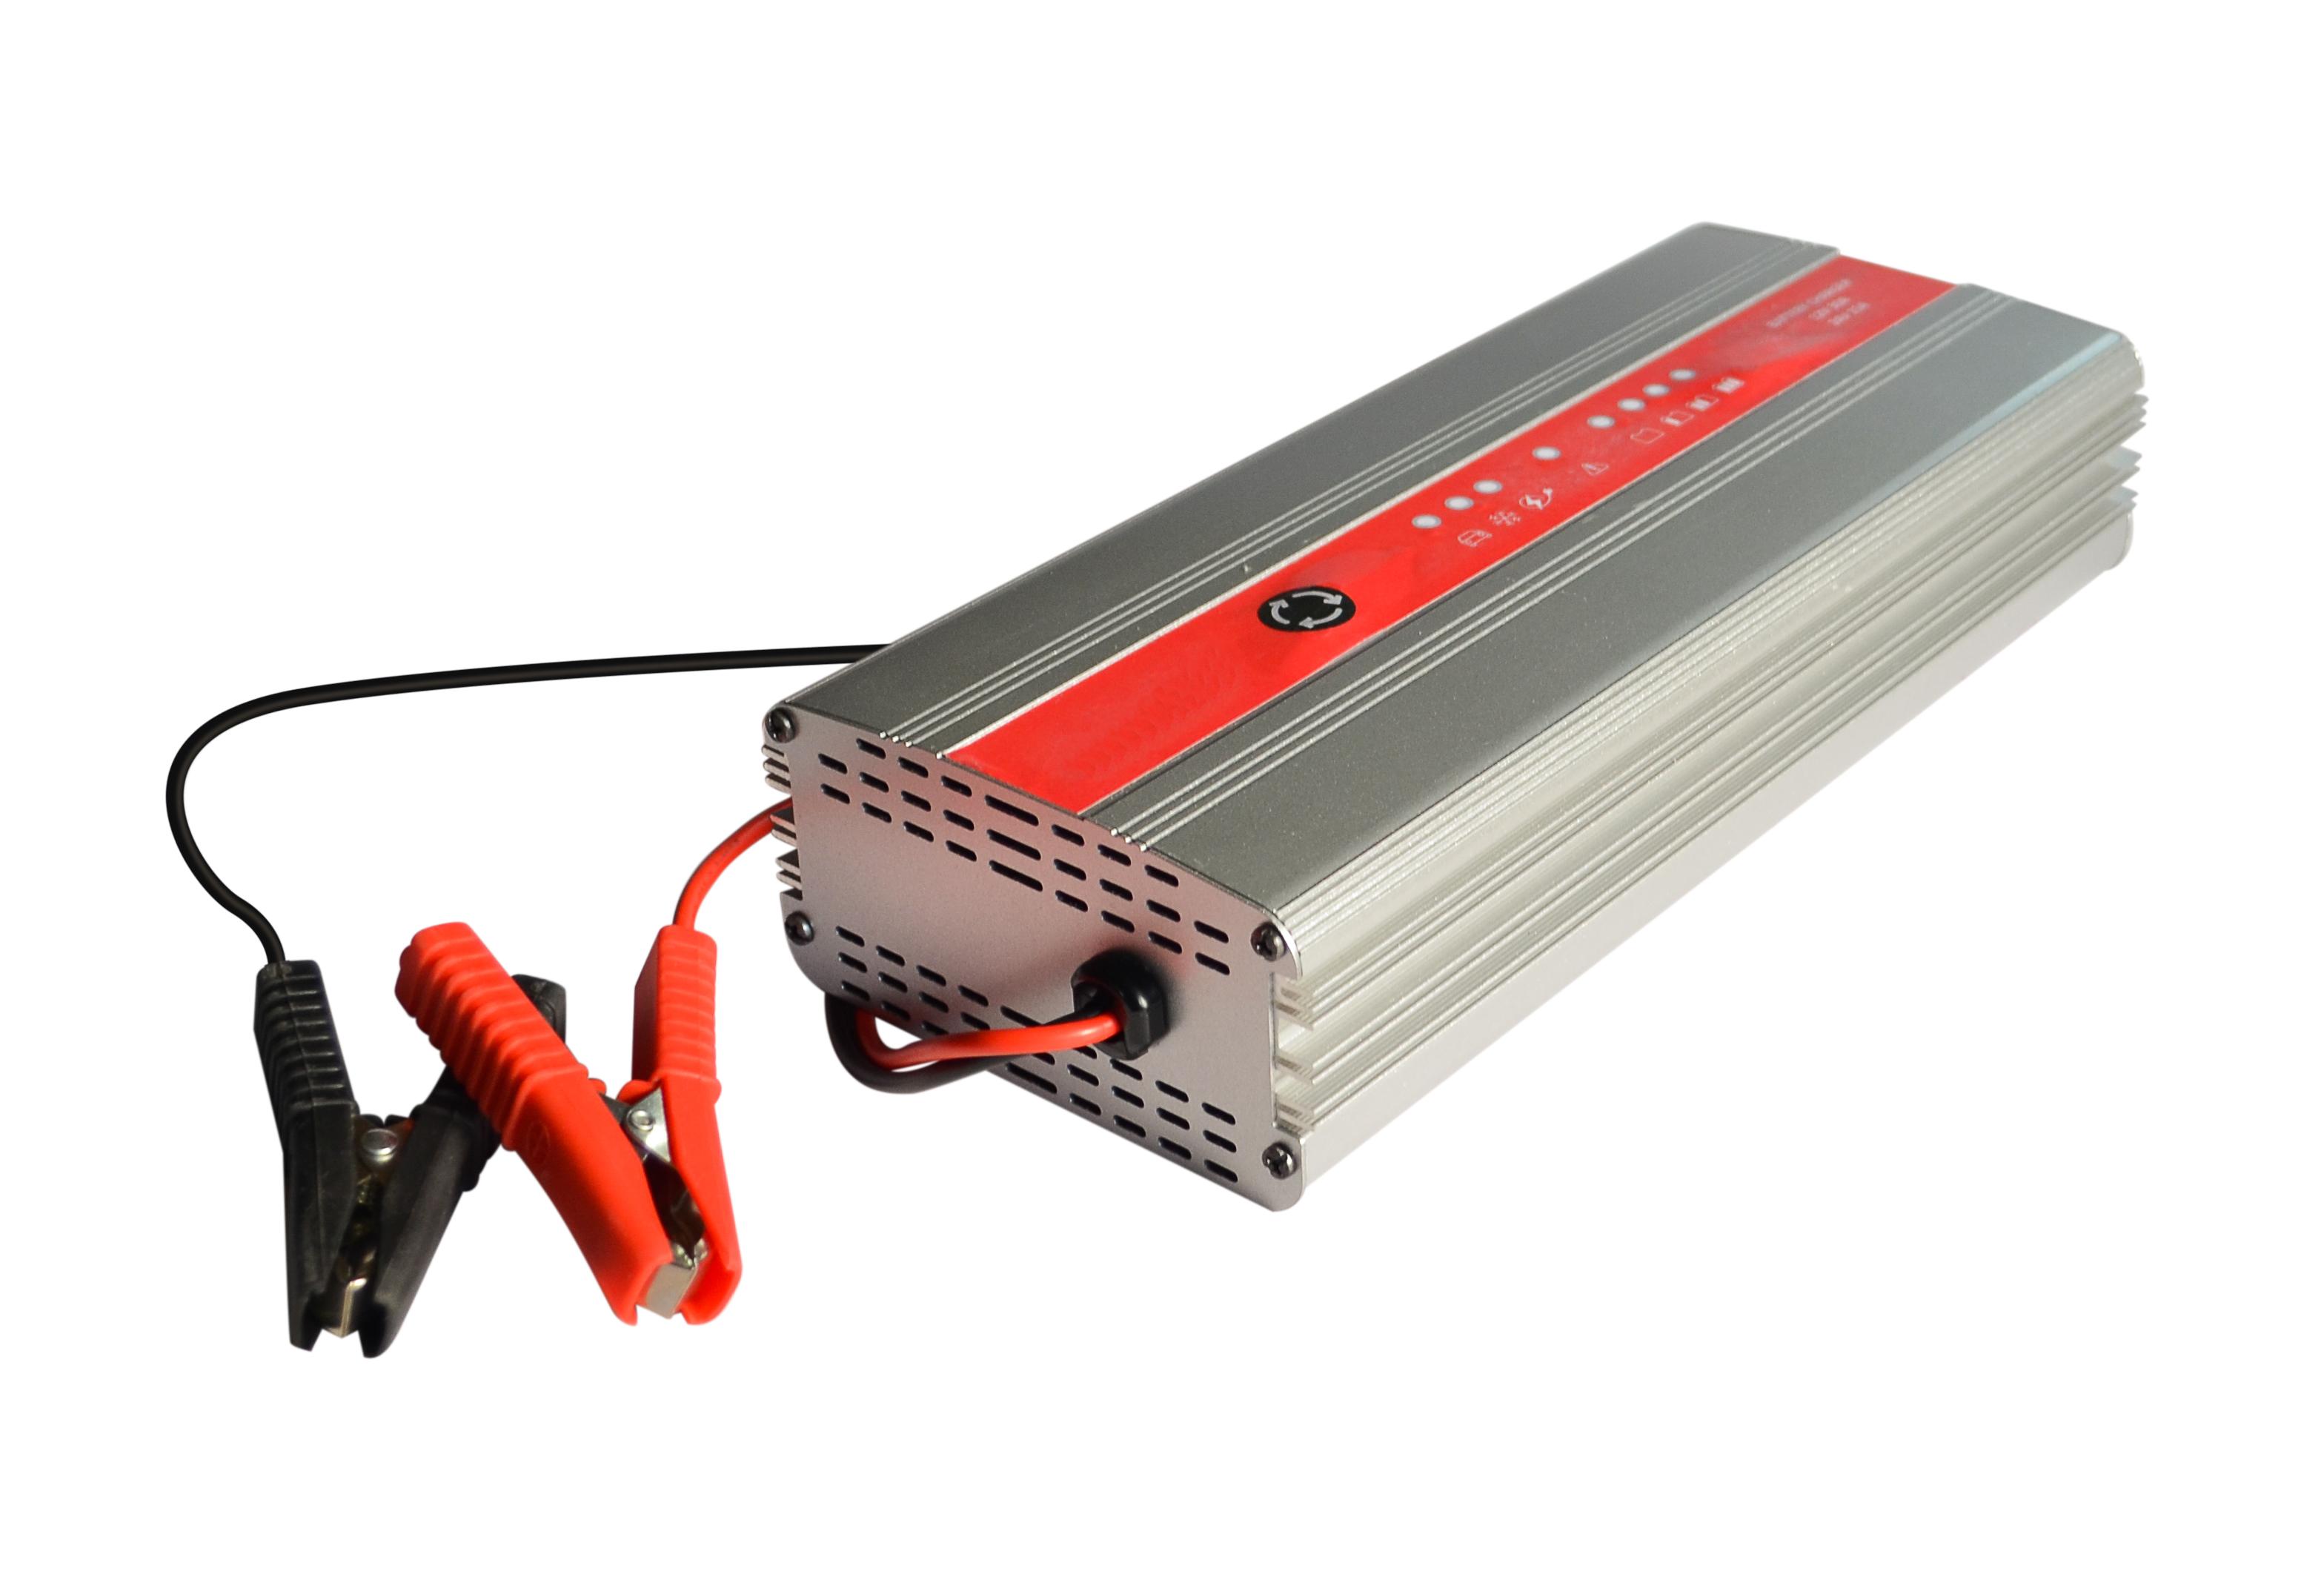 chargeur de batterie automatique pour voiture 30a12v 15a24v 2 tension en 1 whsc 30a12v 15a24v. Black Bedroom Furniture Sets. Home Design Ideas